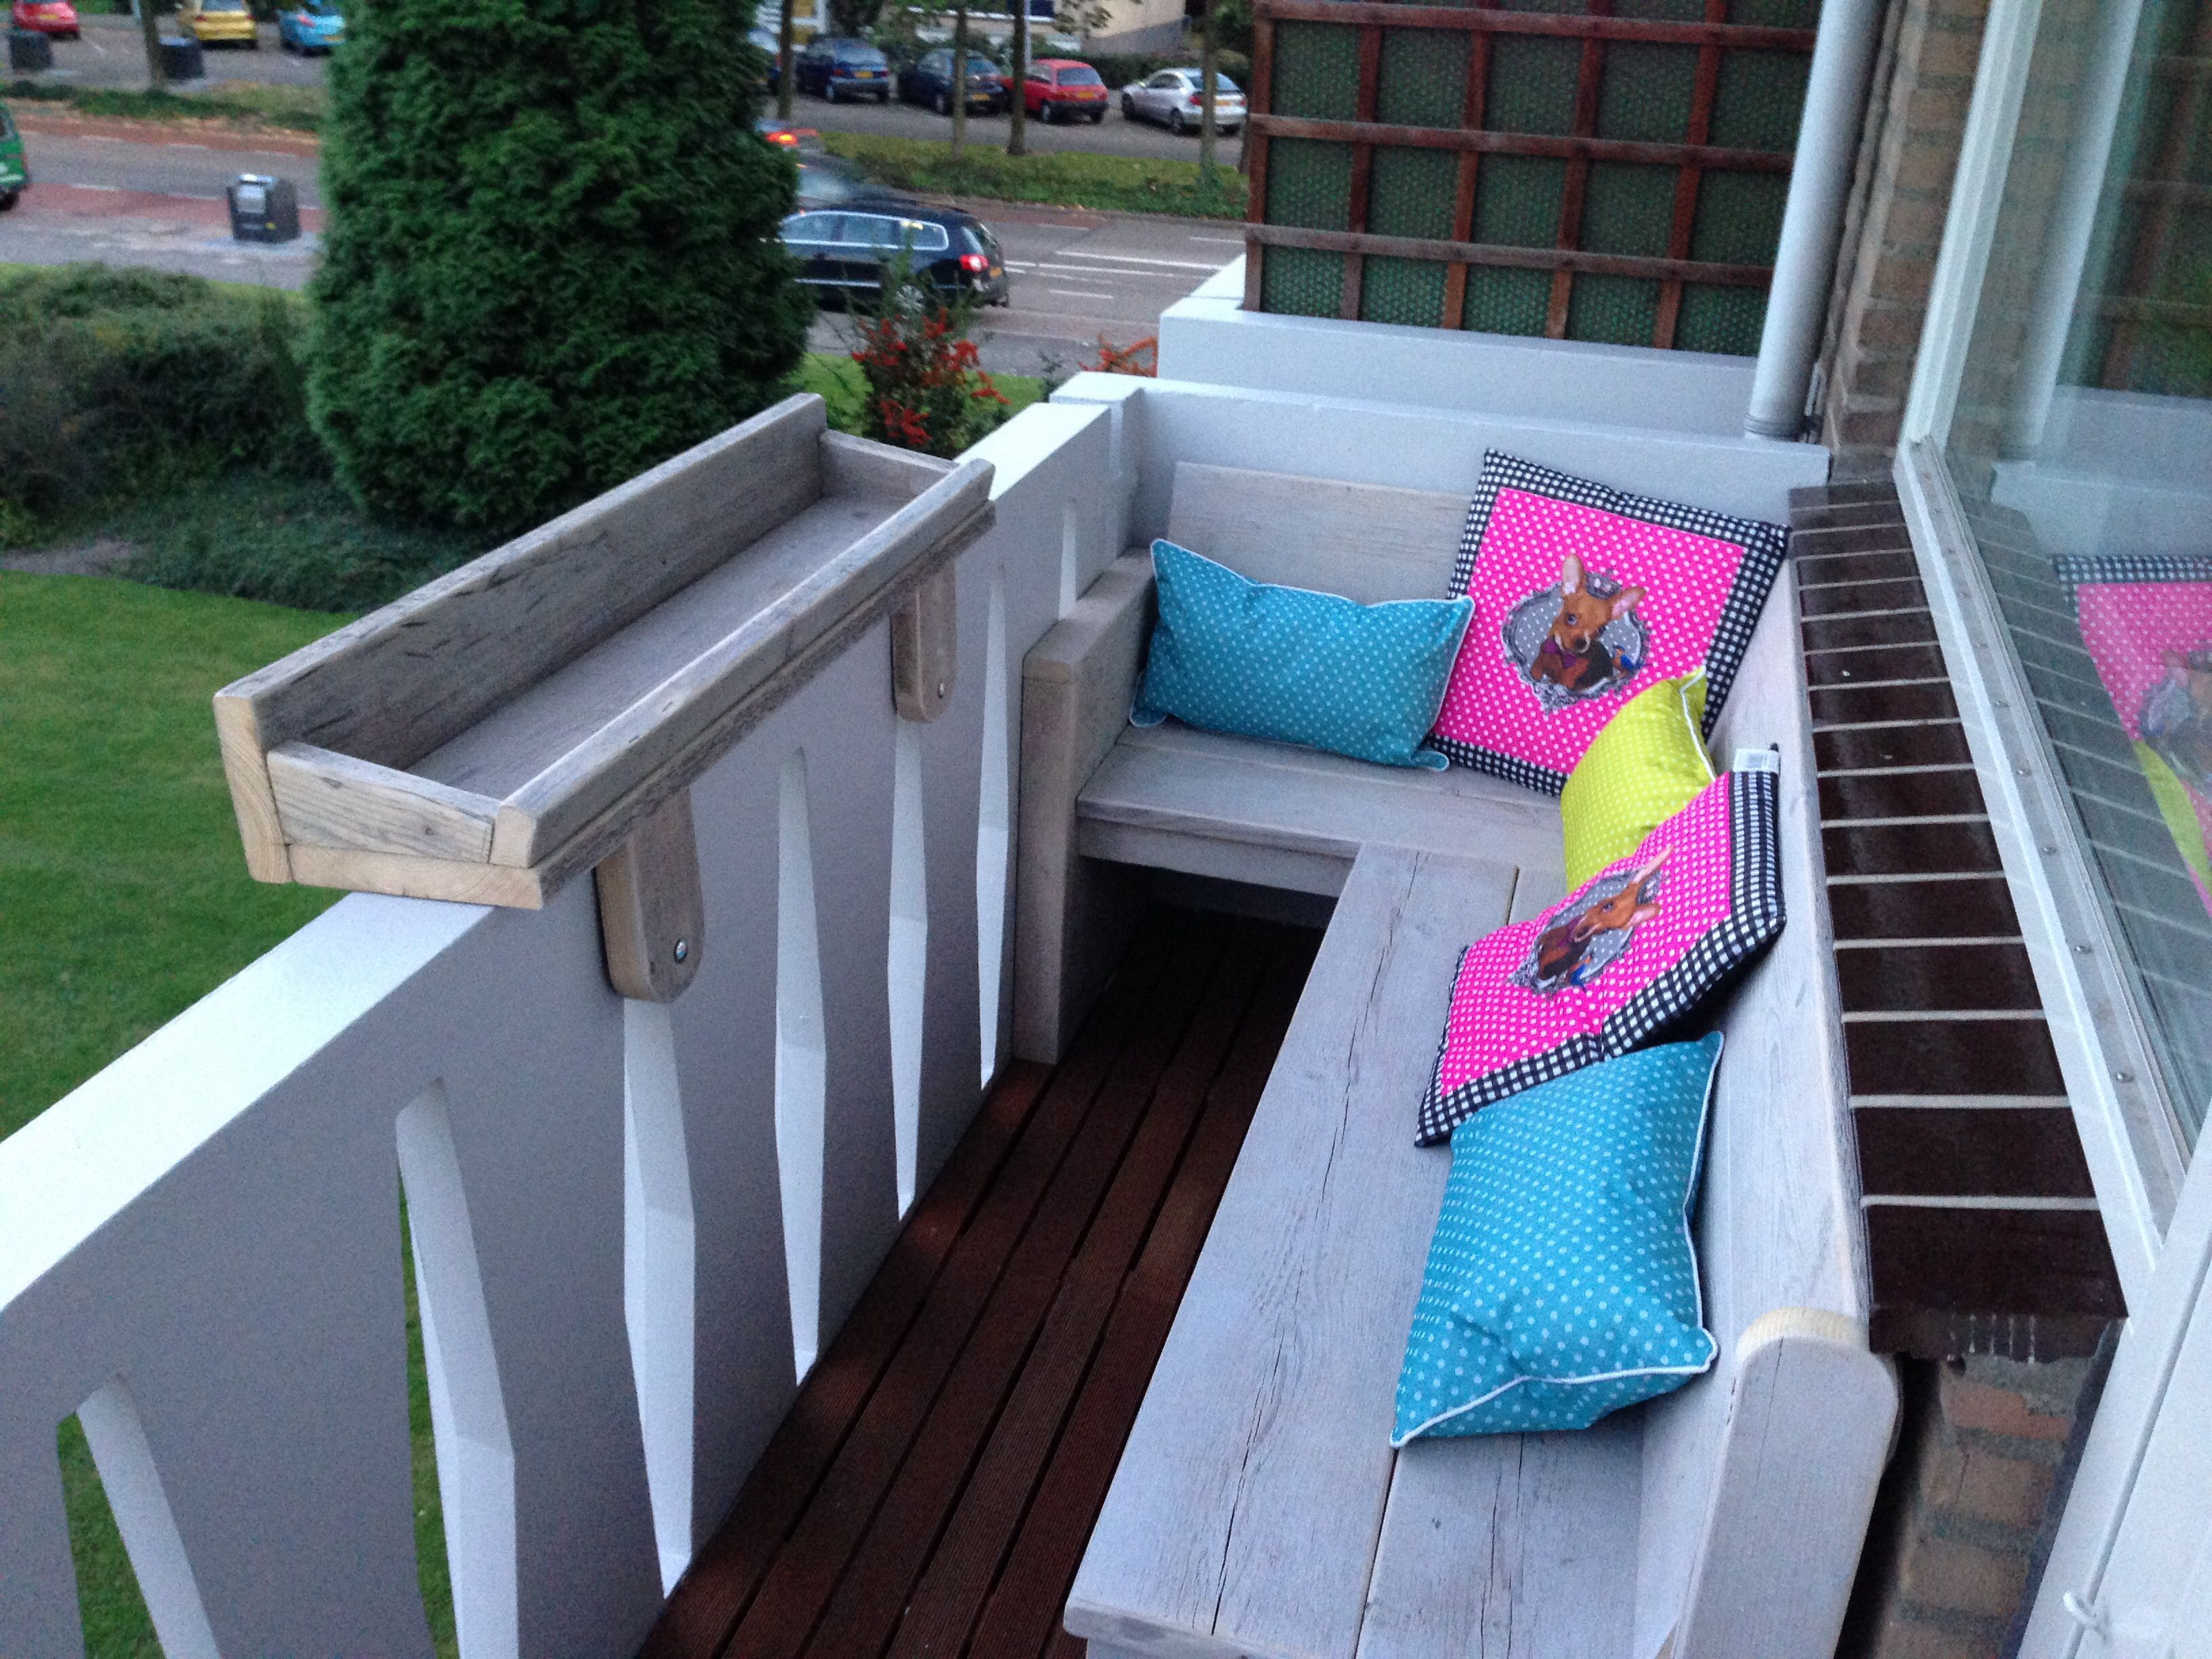 Hoekbankje balkon made by hout vast hout sloophout staal